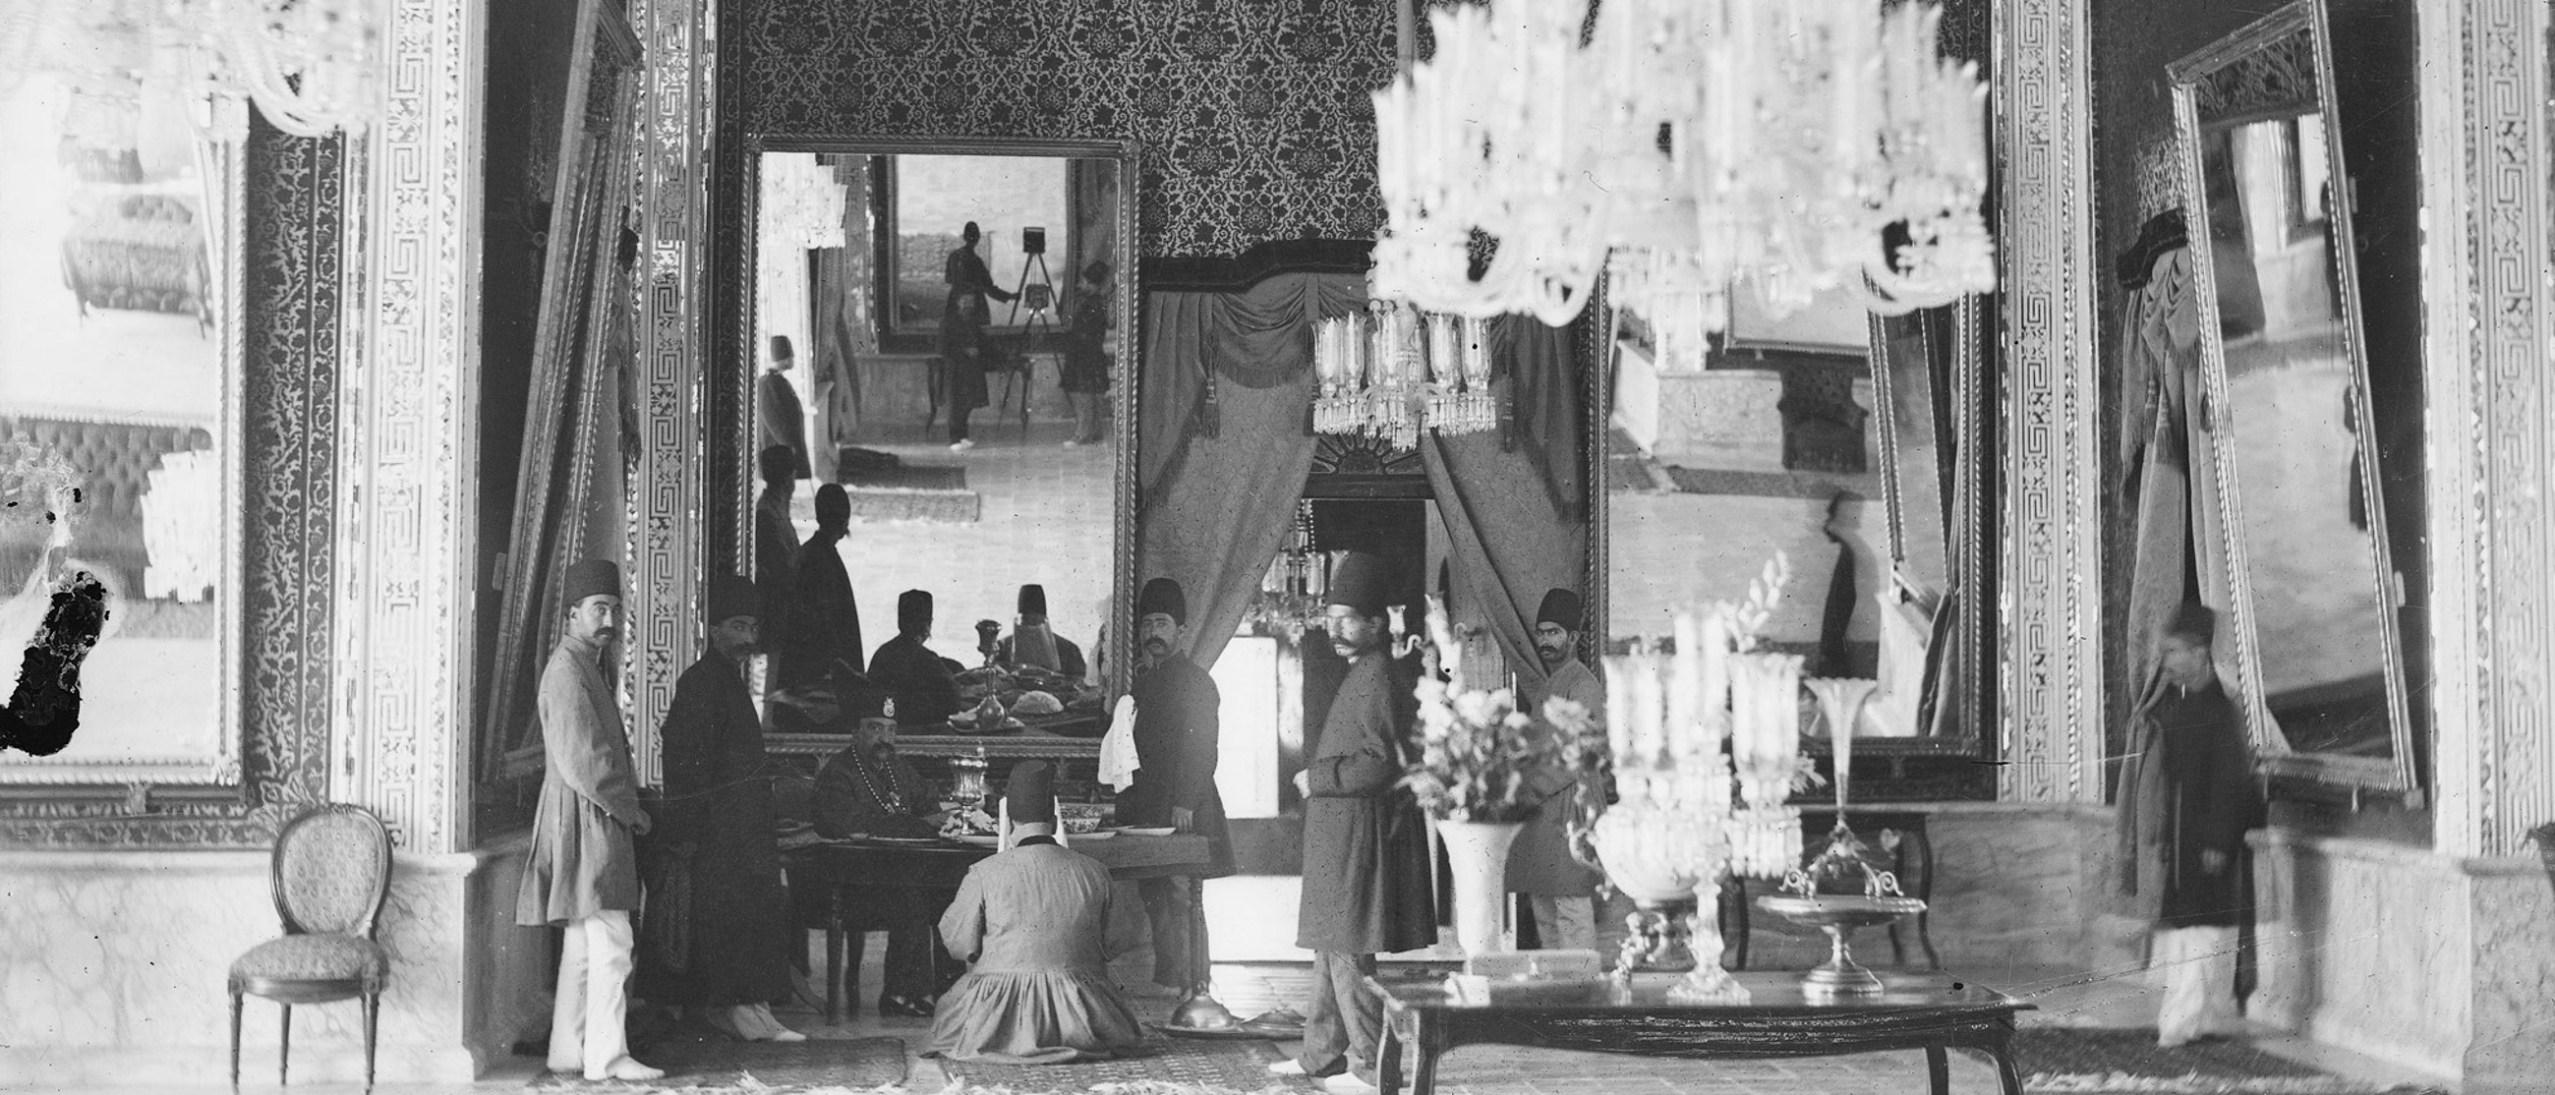 Photo, Tehran (Iran): Kakh-i Sahibqaraniyya (Sahibqaraniyya Palace), Talar-i Ayena (Hall of Mirrors): Nasir Al-Din Shah at his Desk Sevruguin, Antoin, 1880-1930, b&w ; 17.7 cm. x 13 cm. FSA_A.4_2.12.GN.03.06